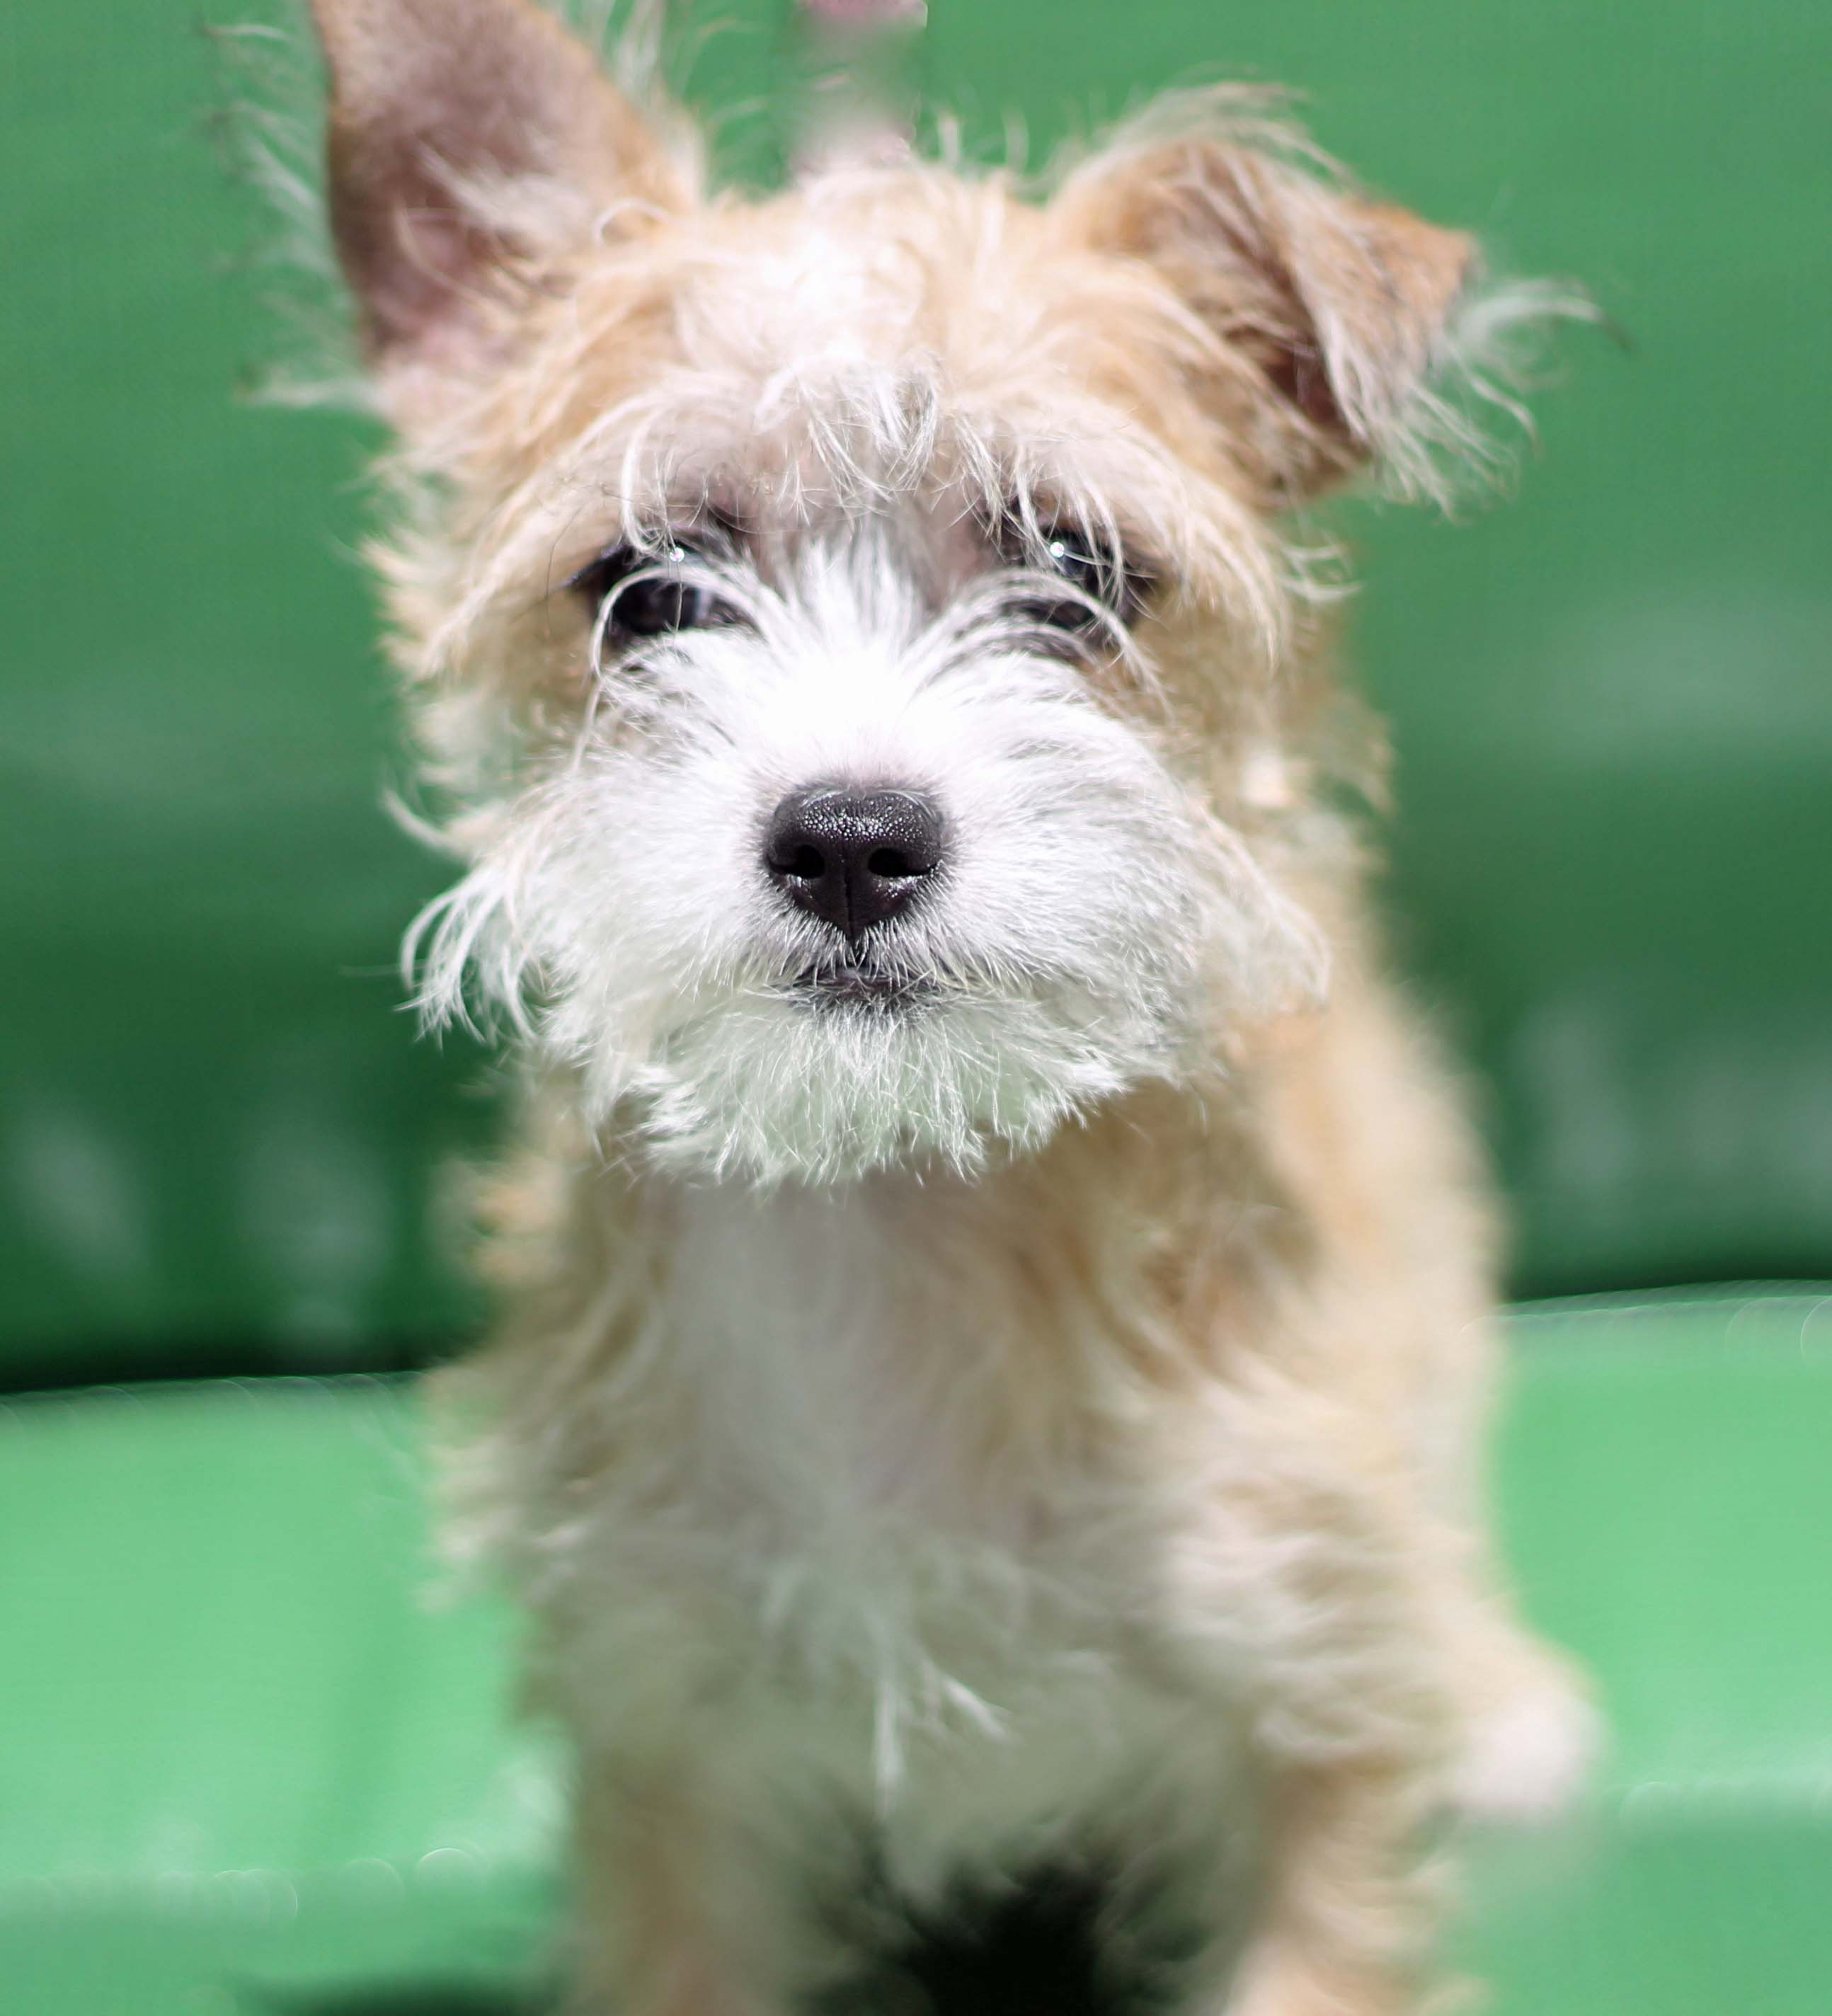 emily - doggie protective services - smaller